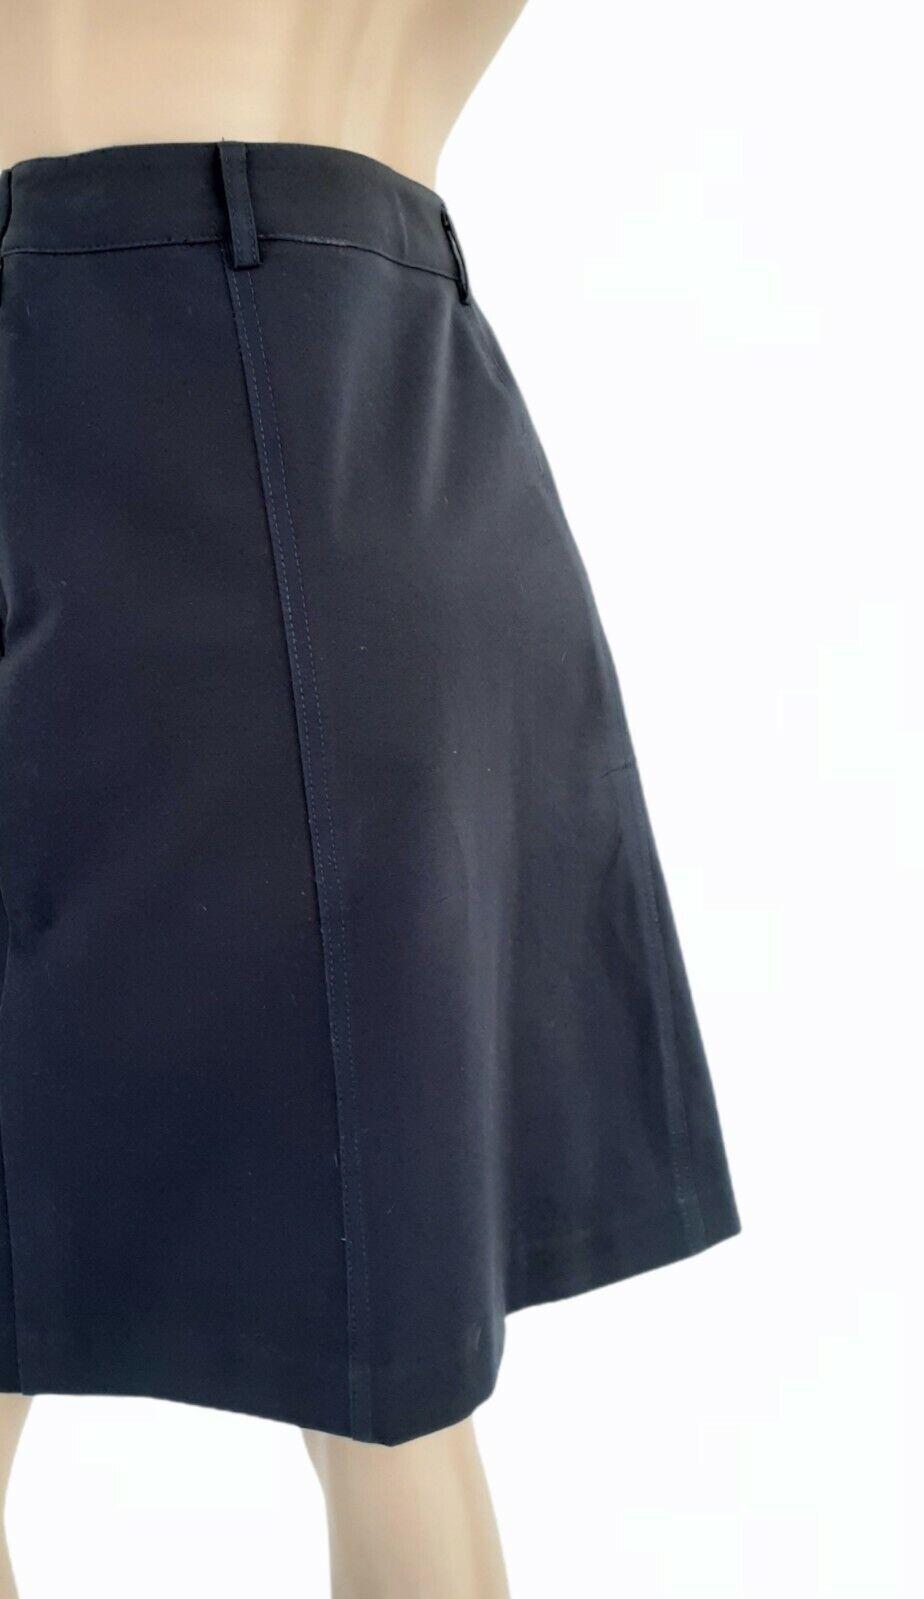 J McLaughlin Teal Button Front A Line Skirt Size 2 - image 7